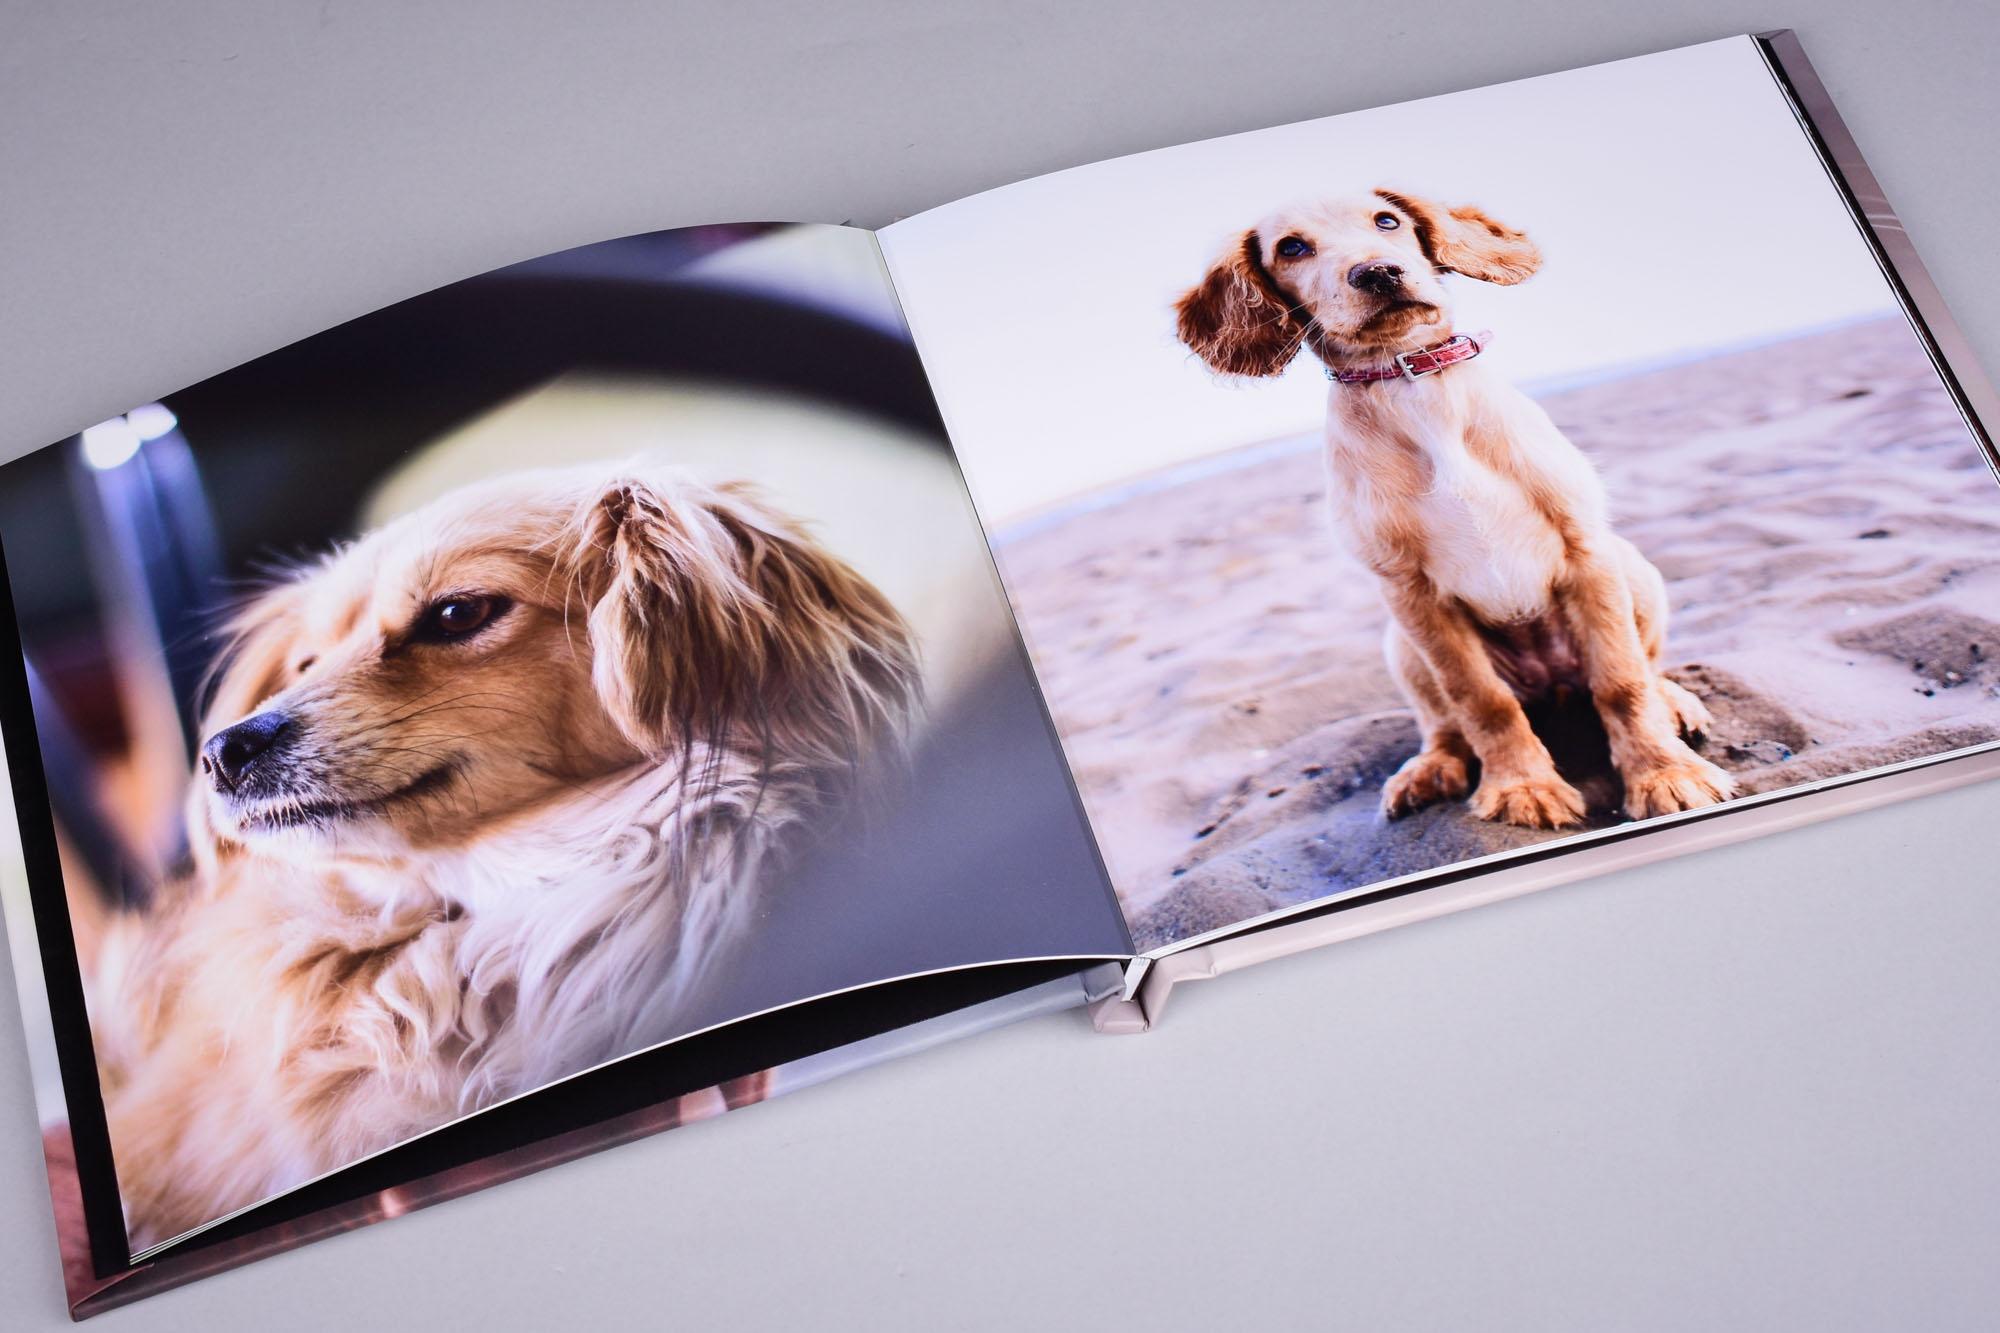 DreamBook 4K - Pet Photography